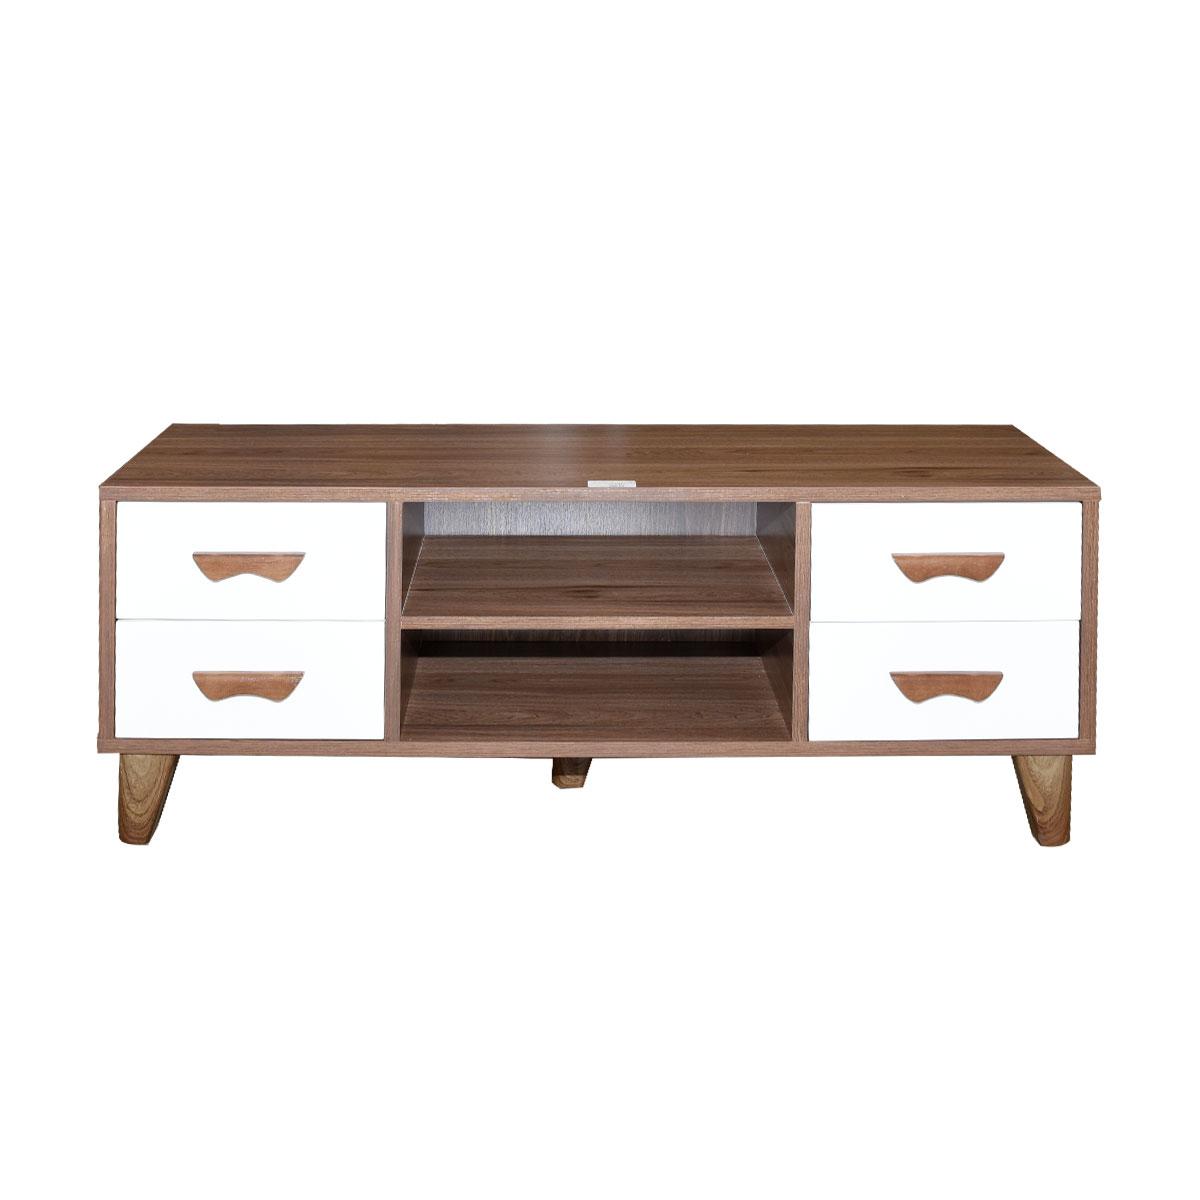 طاولة تلفاز خشب مقاس 140 * 40 * 46 سم , رقم D-3 /15100262